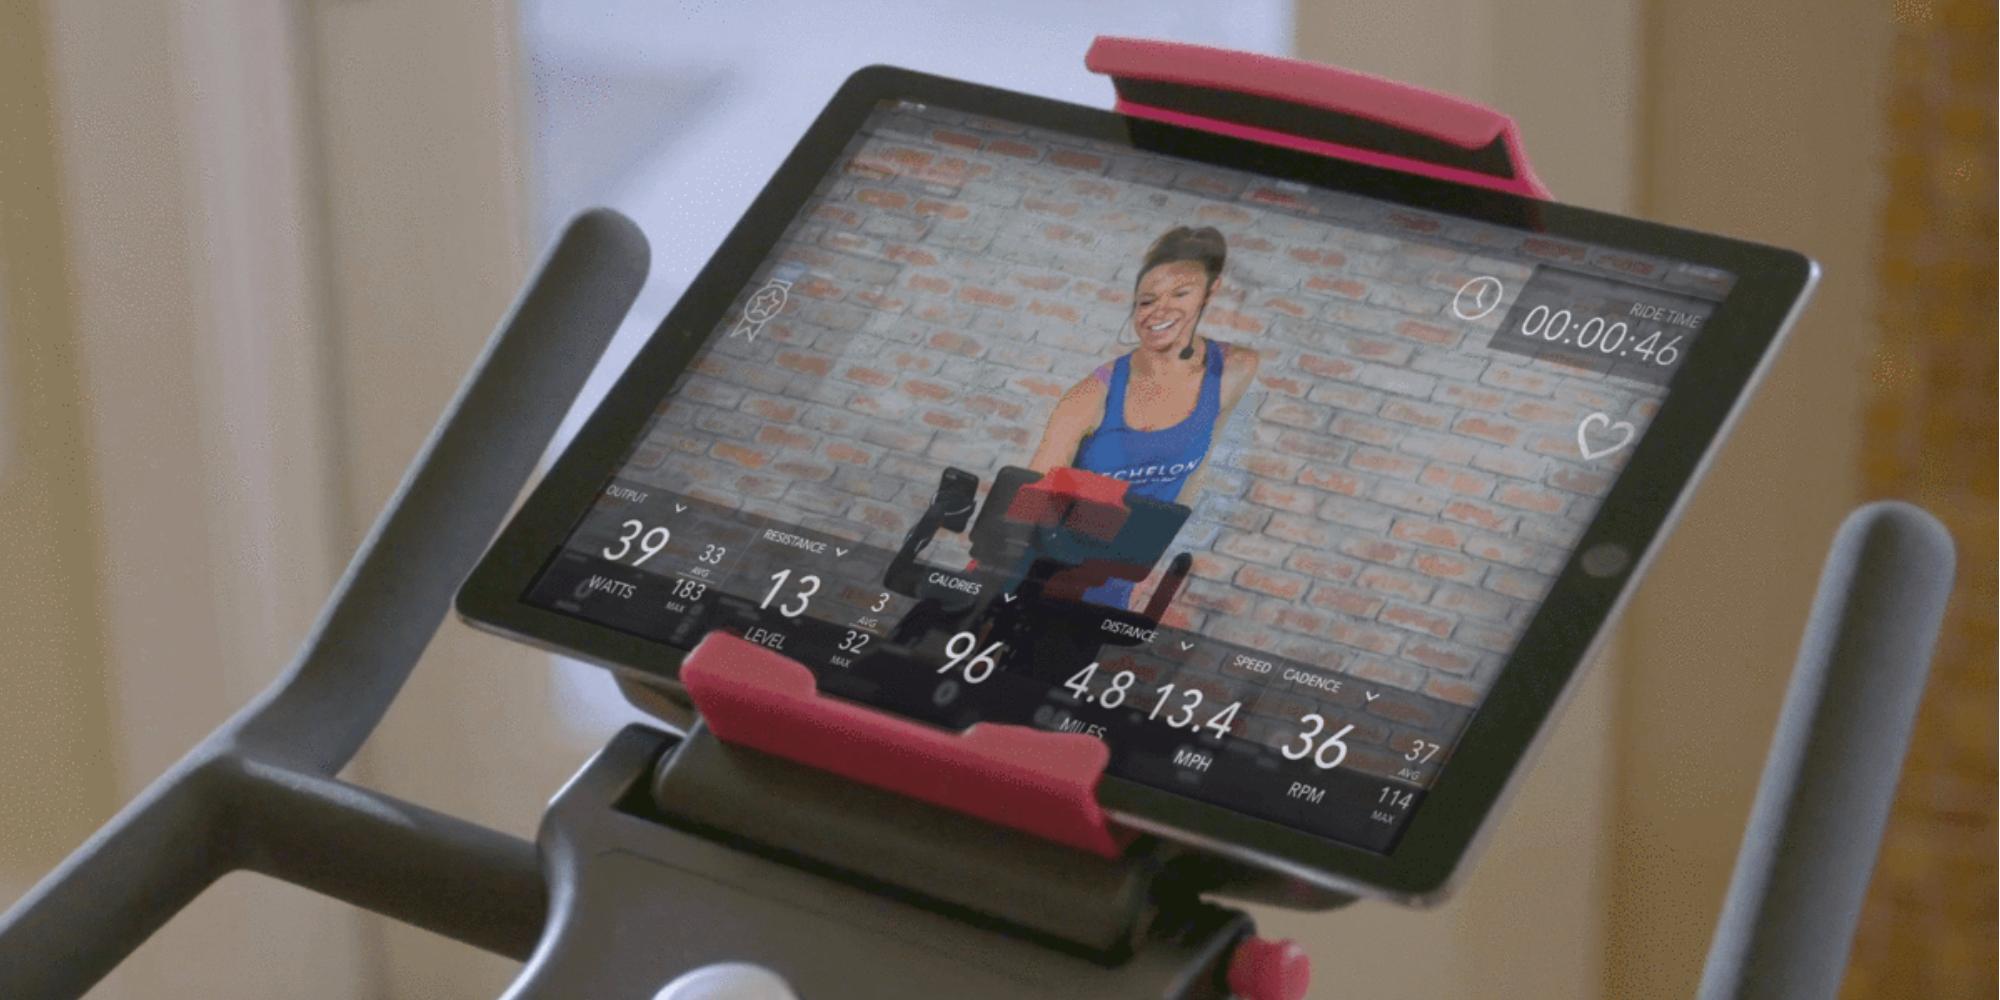 Echelon Connect Bike iPad app